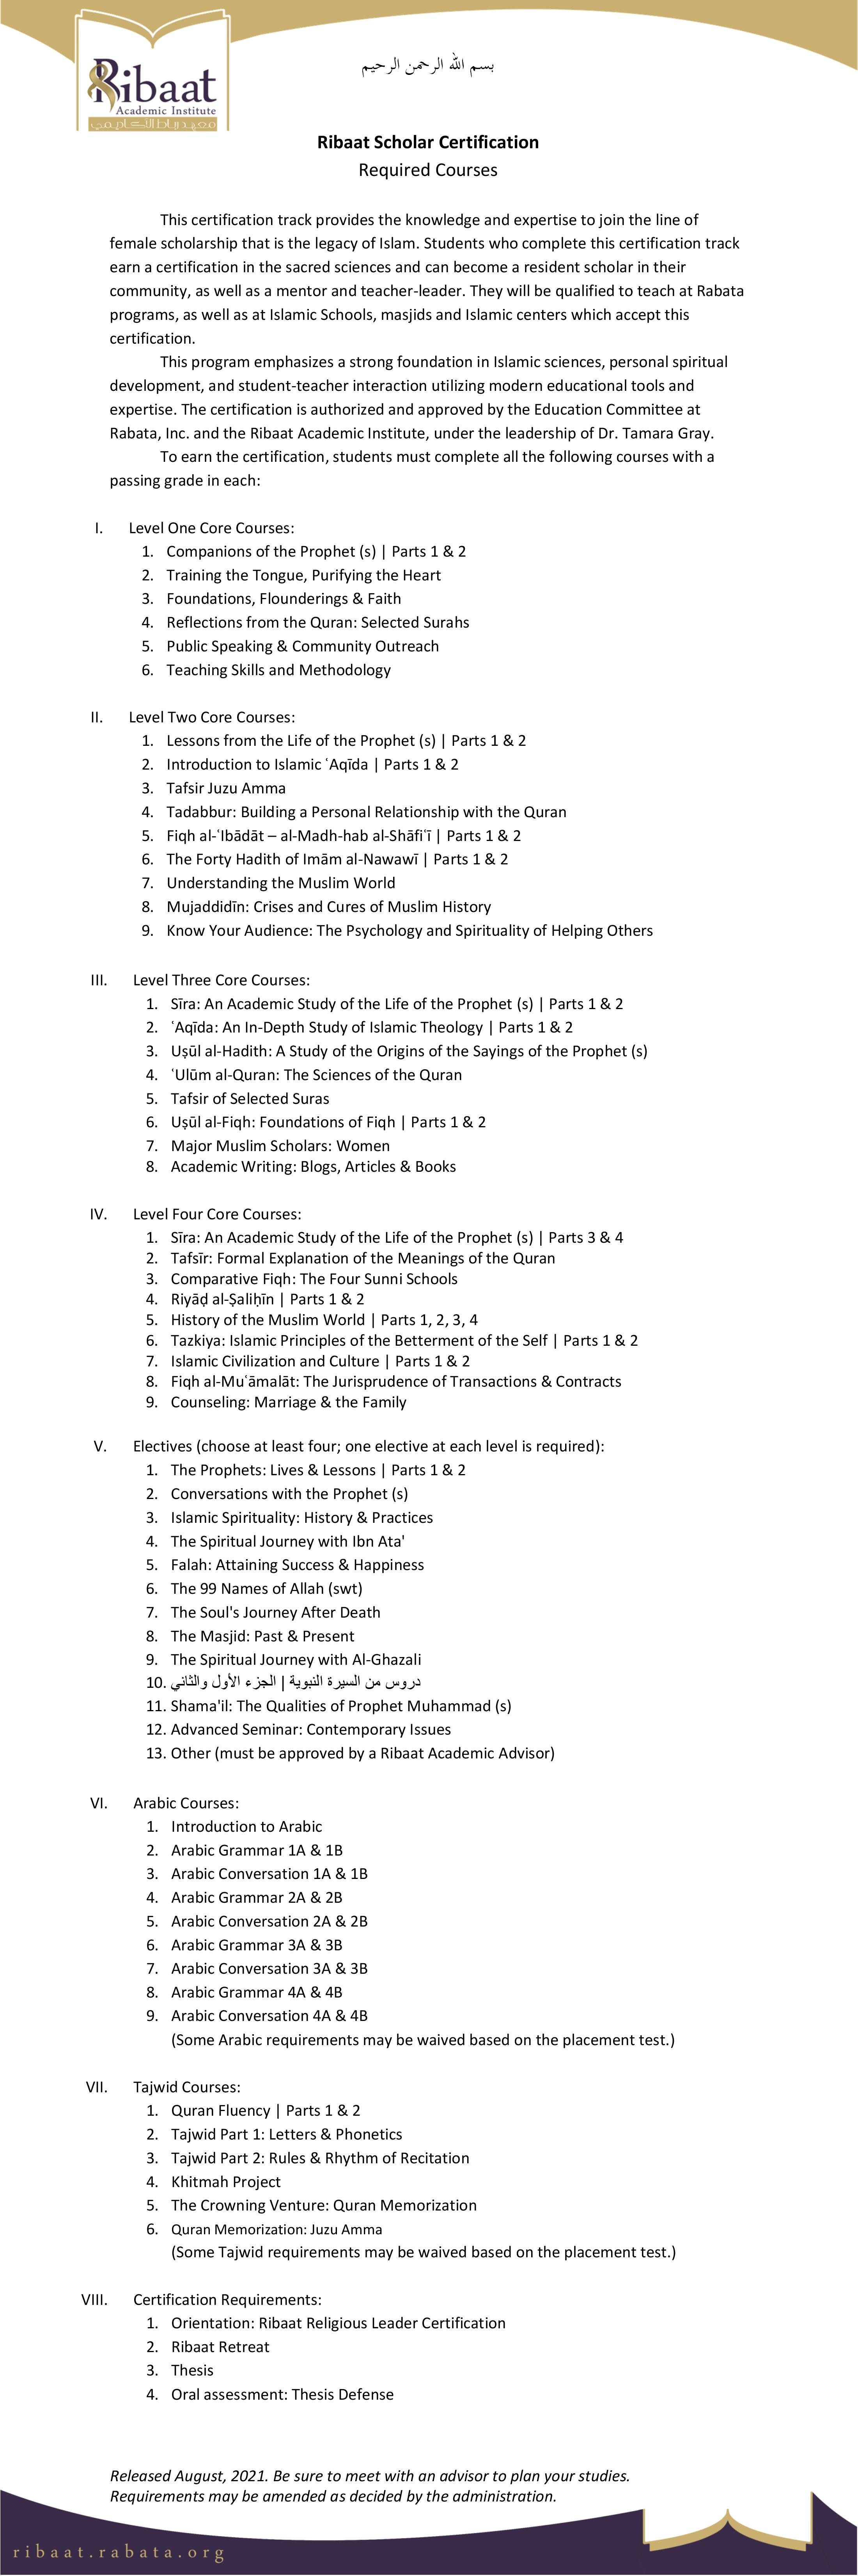 Required Courses - Ribaat Scholar 2021